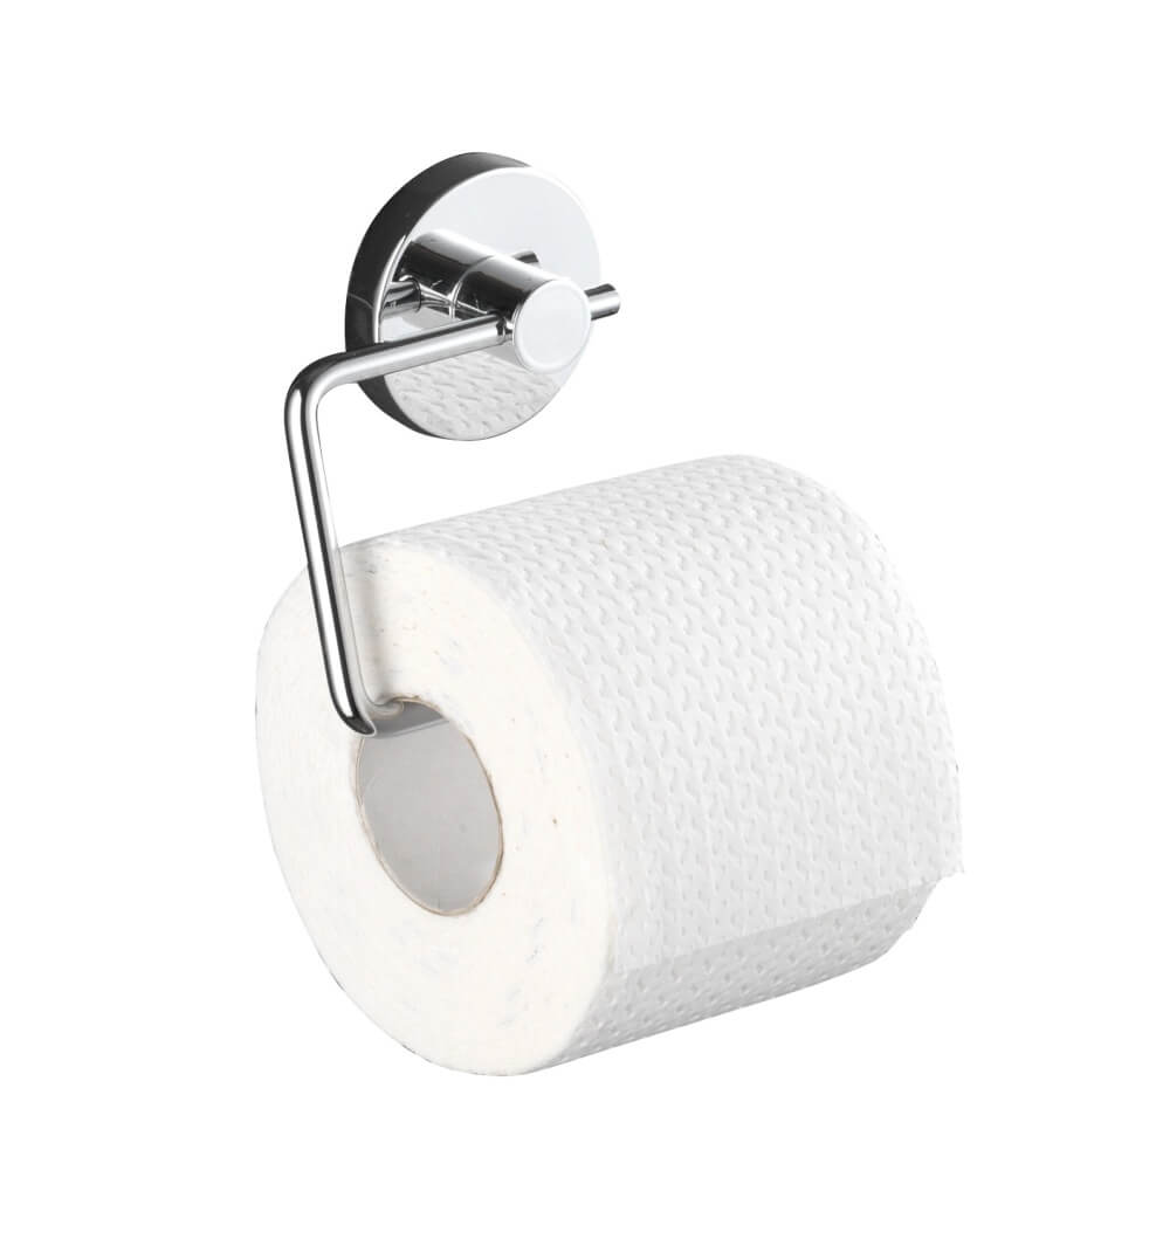 Vacuum-Loc držák na WC papír z20899100